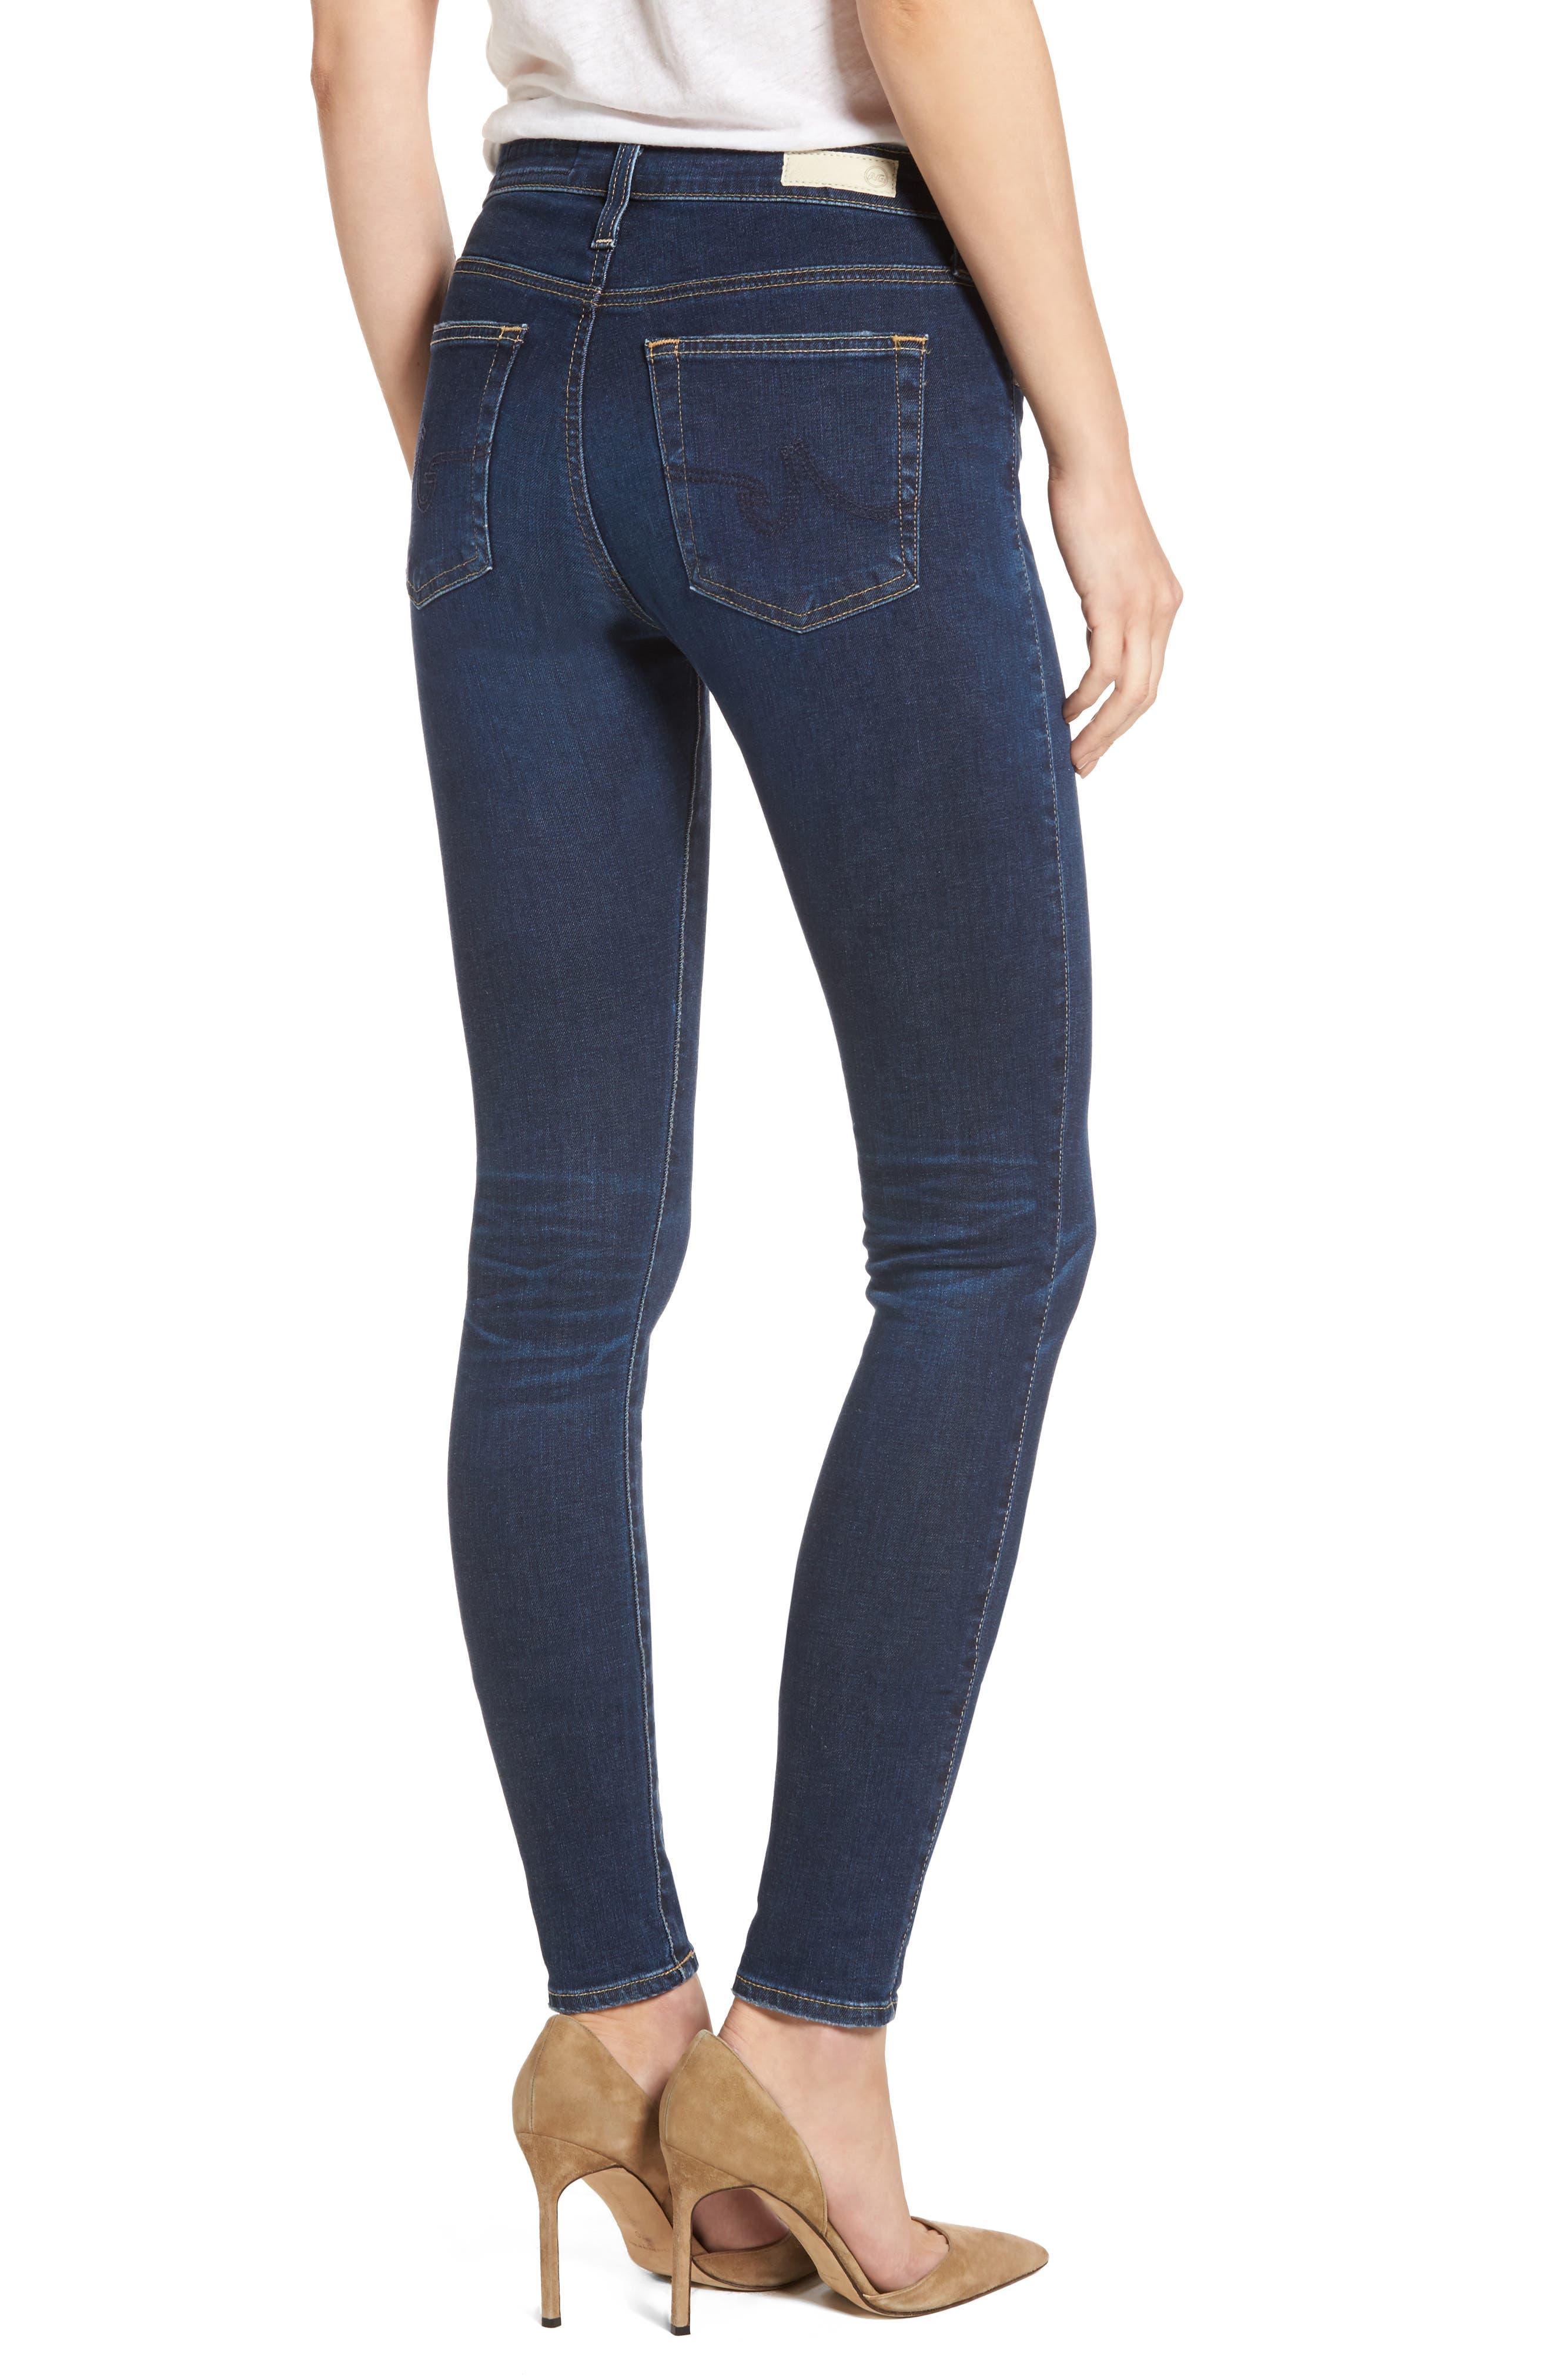 'The Farrah' High Rise Skinny Jeans,                             Alternate thumbnail 16, color,